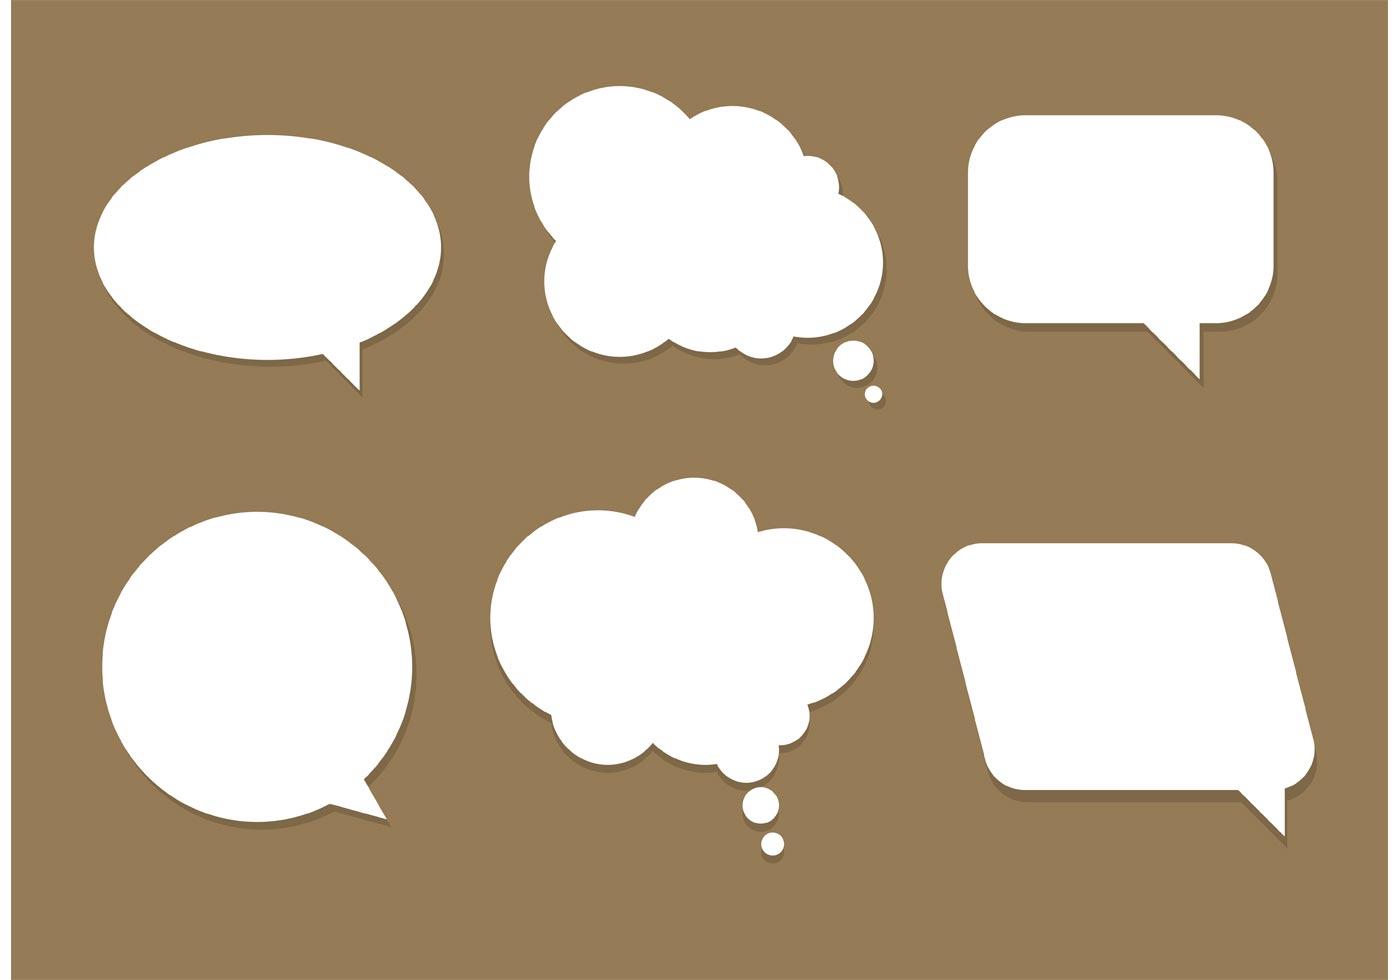 speech bubble free vector art 1 875 speech bubble images rh vecteezy com speech bubble vector png vector speech bubble transparent